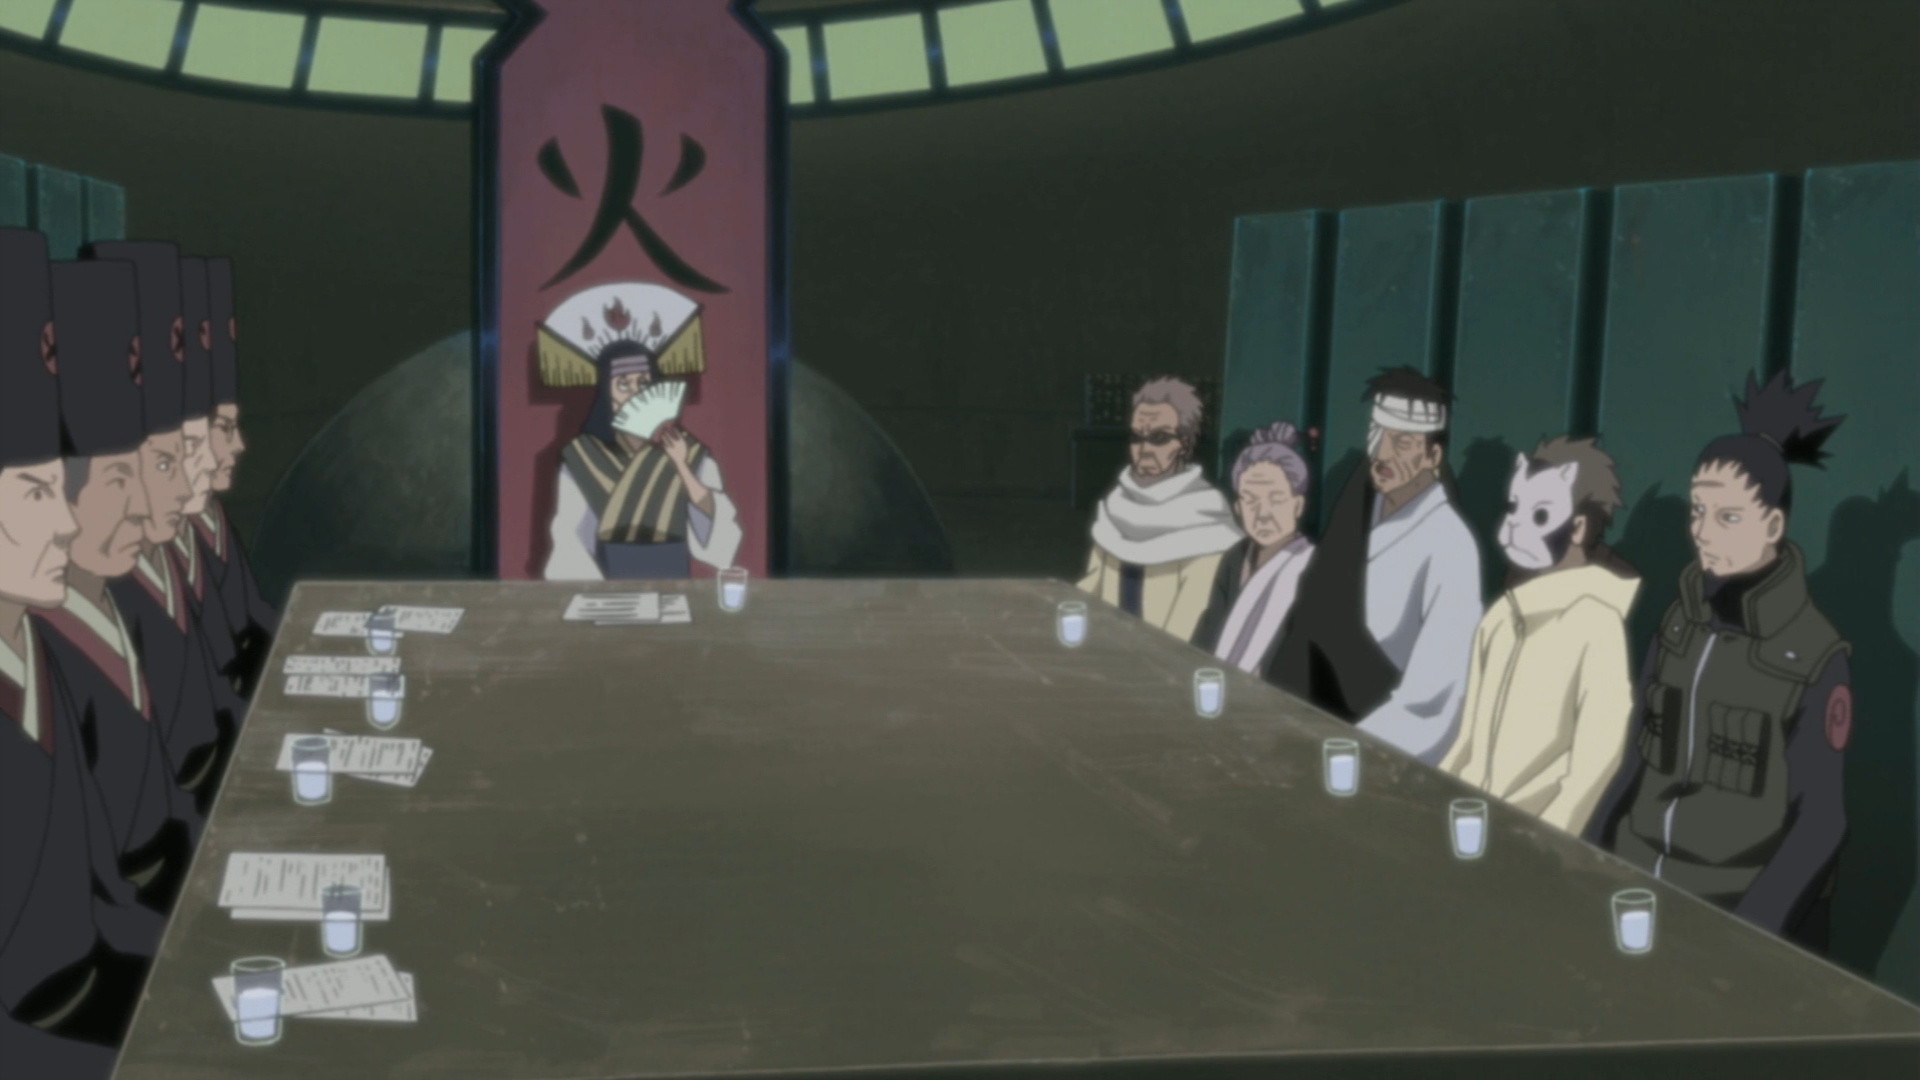 Shikaku Nara Narutopedia Fandom Powered By Wikia Smart Fuse Box Wiki Five Kage Summit